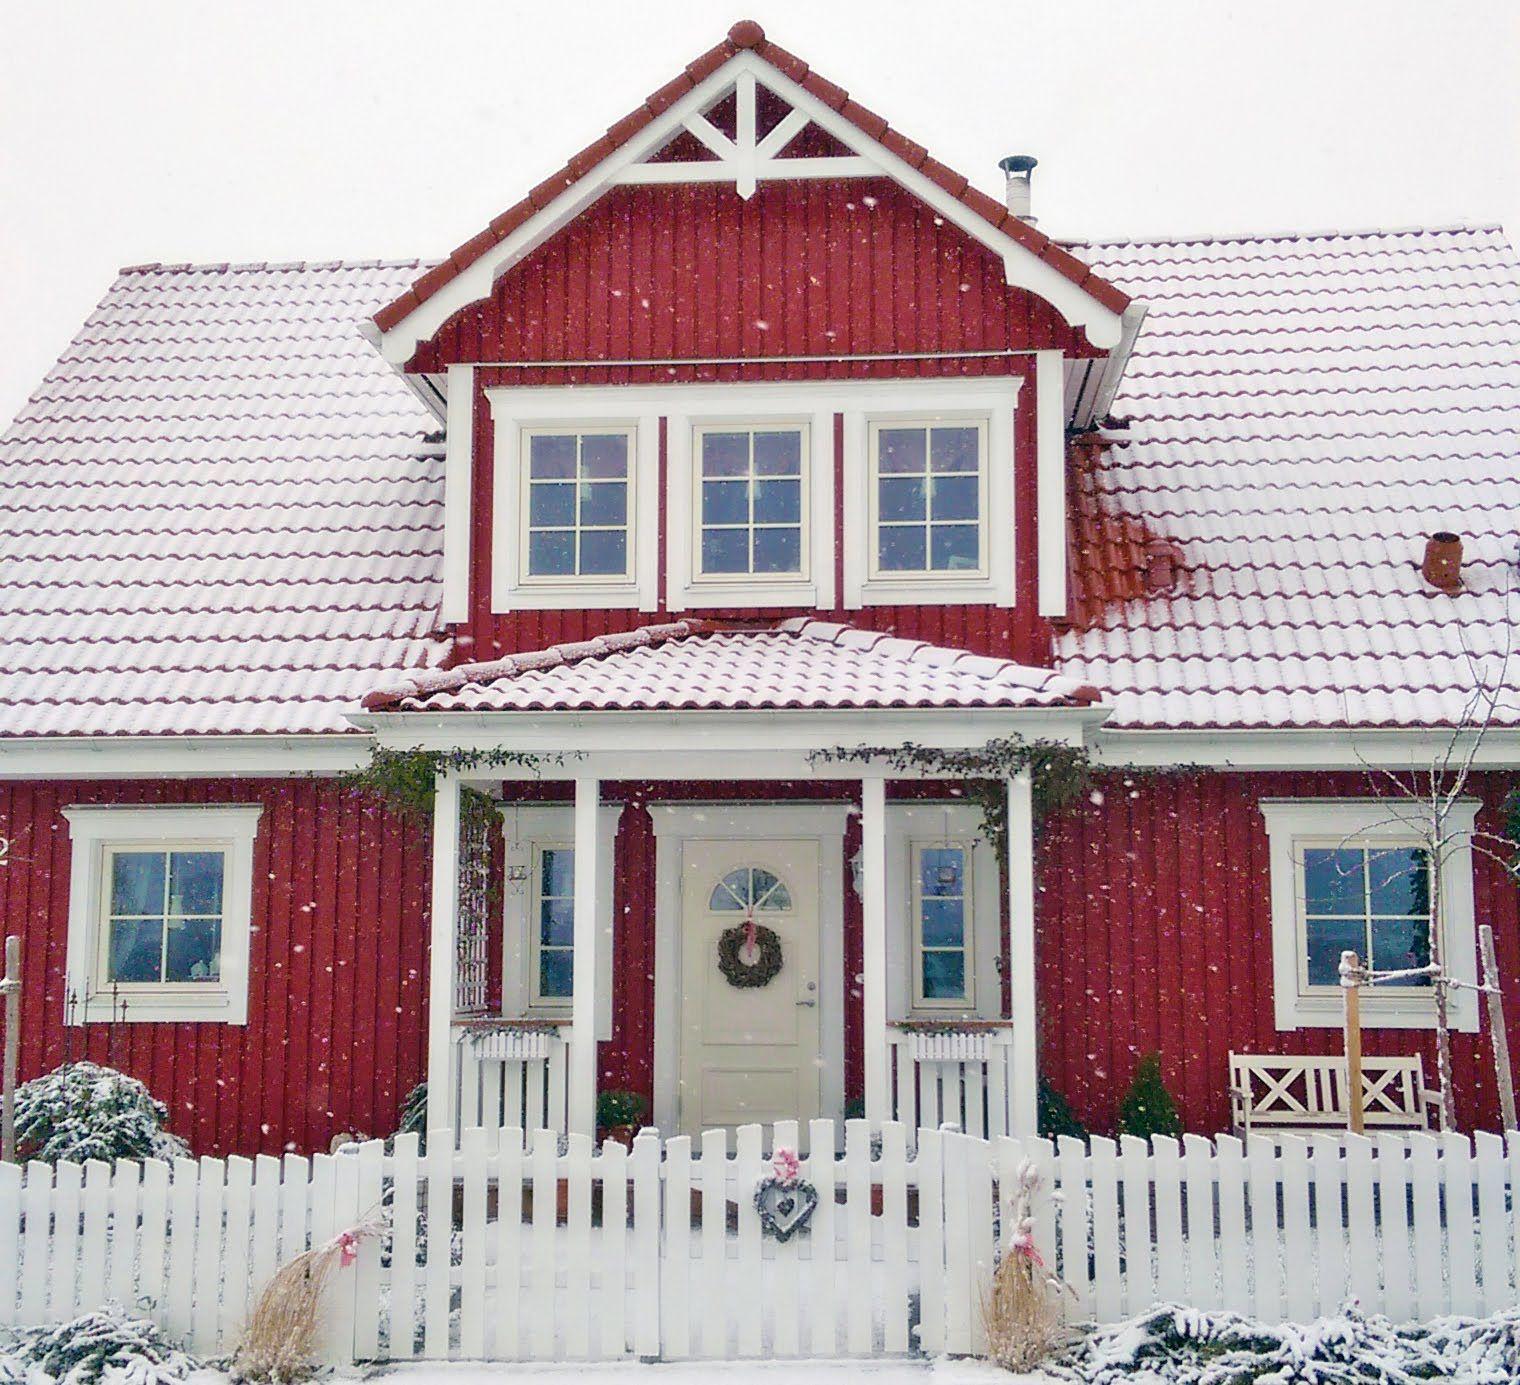 Das ferienhaus in kanada pinteres for Skandinavien haus bauen